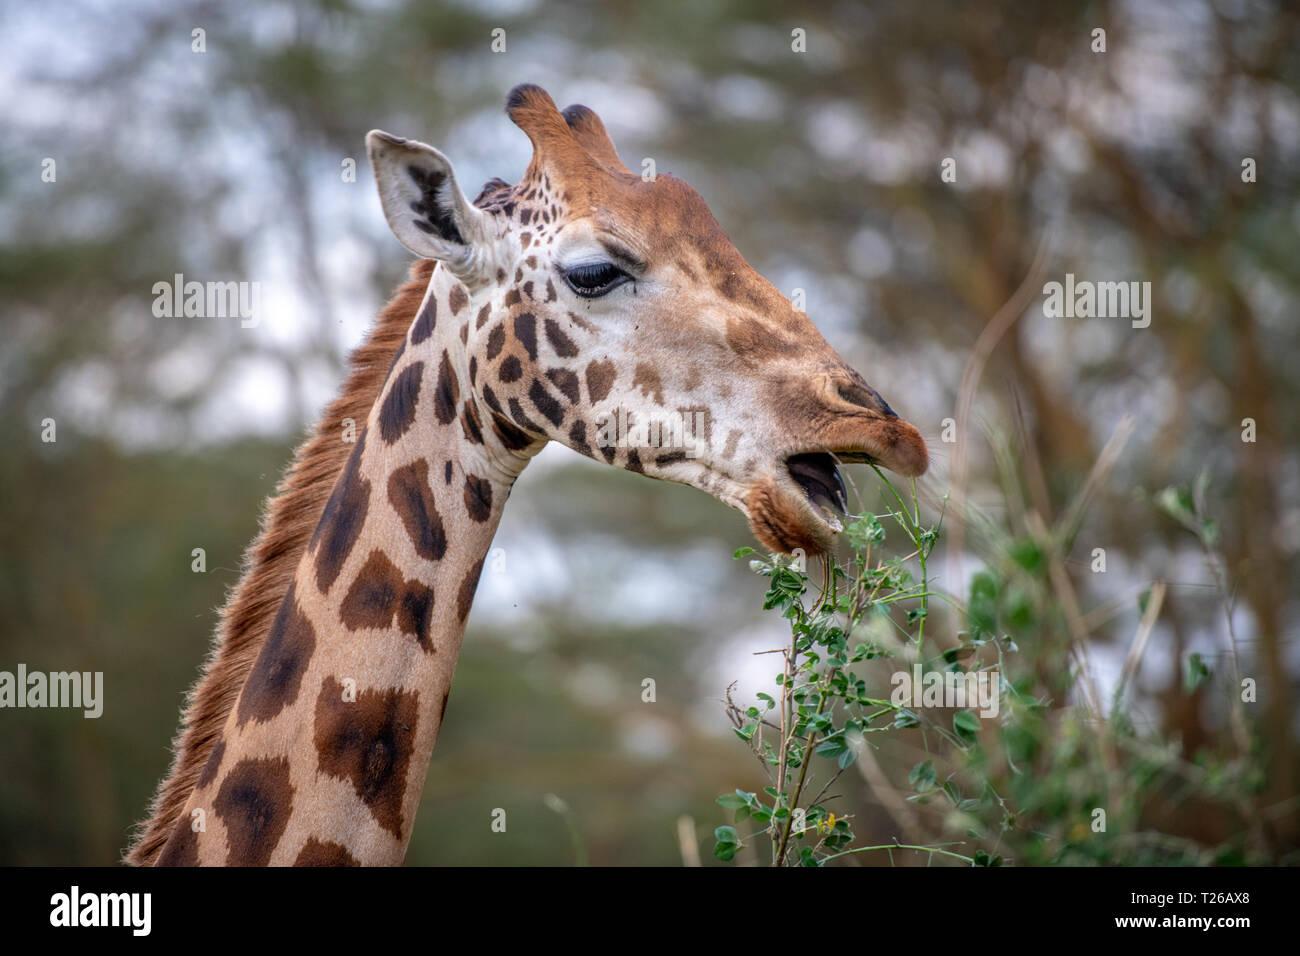 A Rothschild's giraffe (Giraffa camelopardalis rothschildi) eating leaves from a tree in Nakuru National Park, Kenya - Stock Image